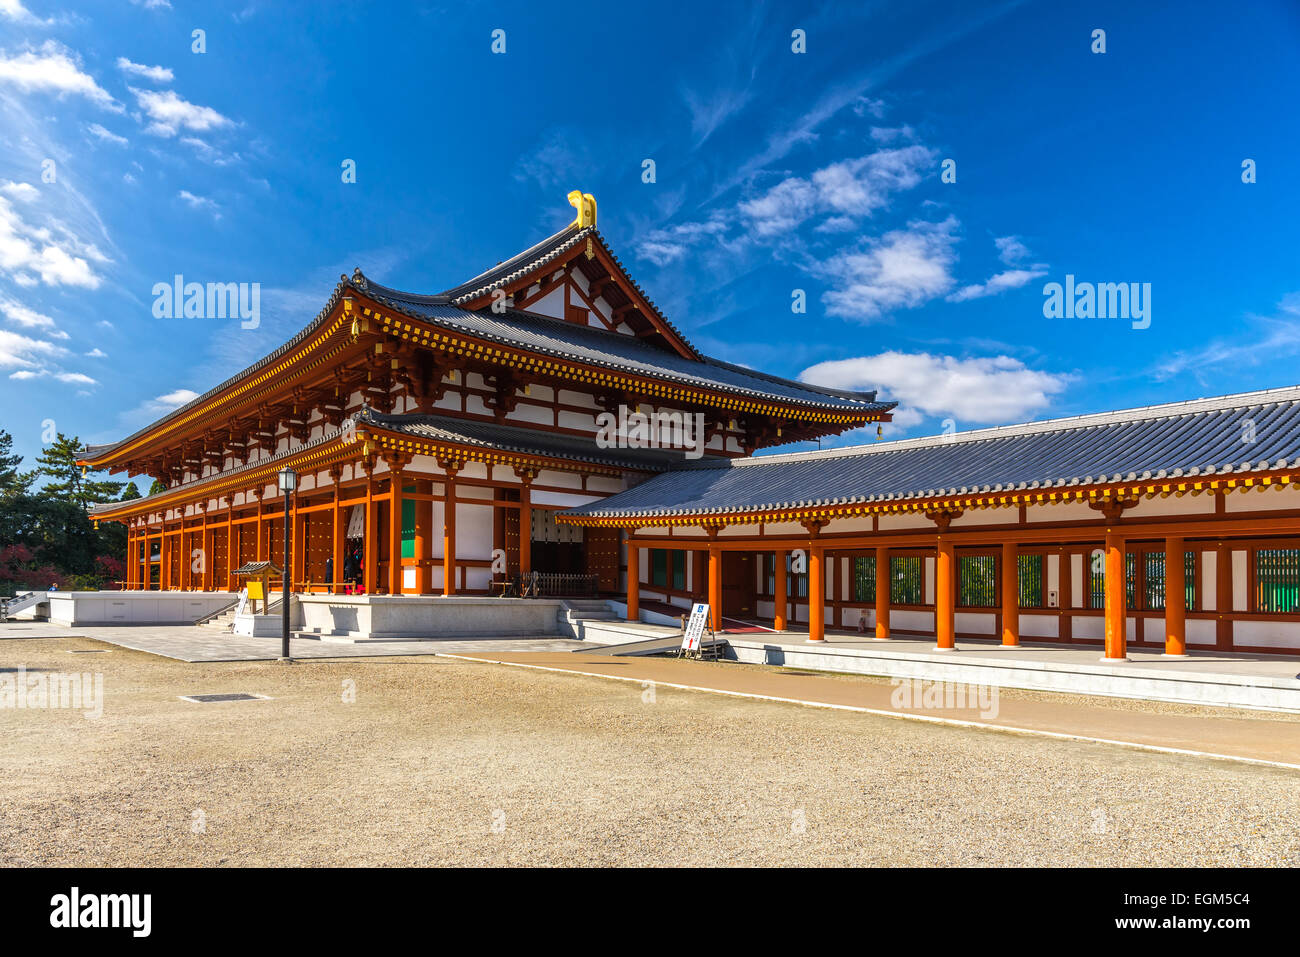 Yakushi-ji Temple in Nara, Unesco world Heritage site, Japan - Stock Image